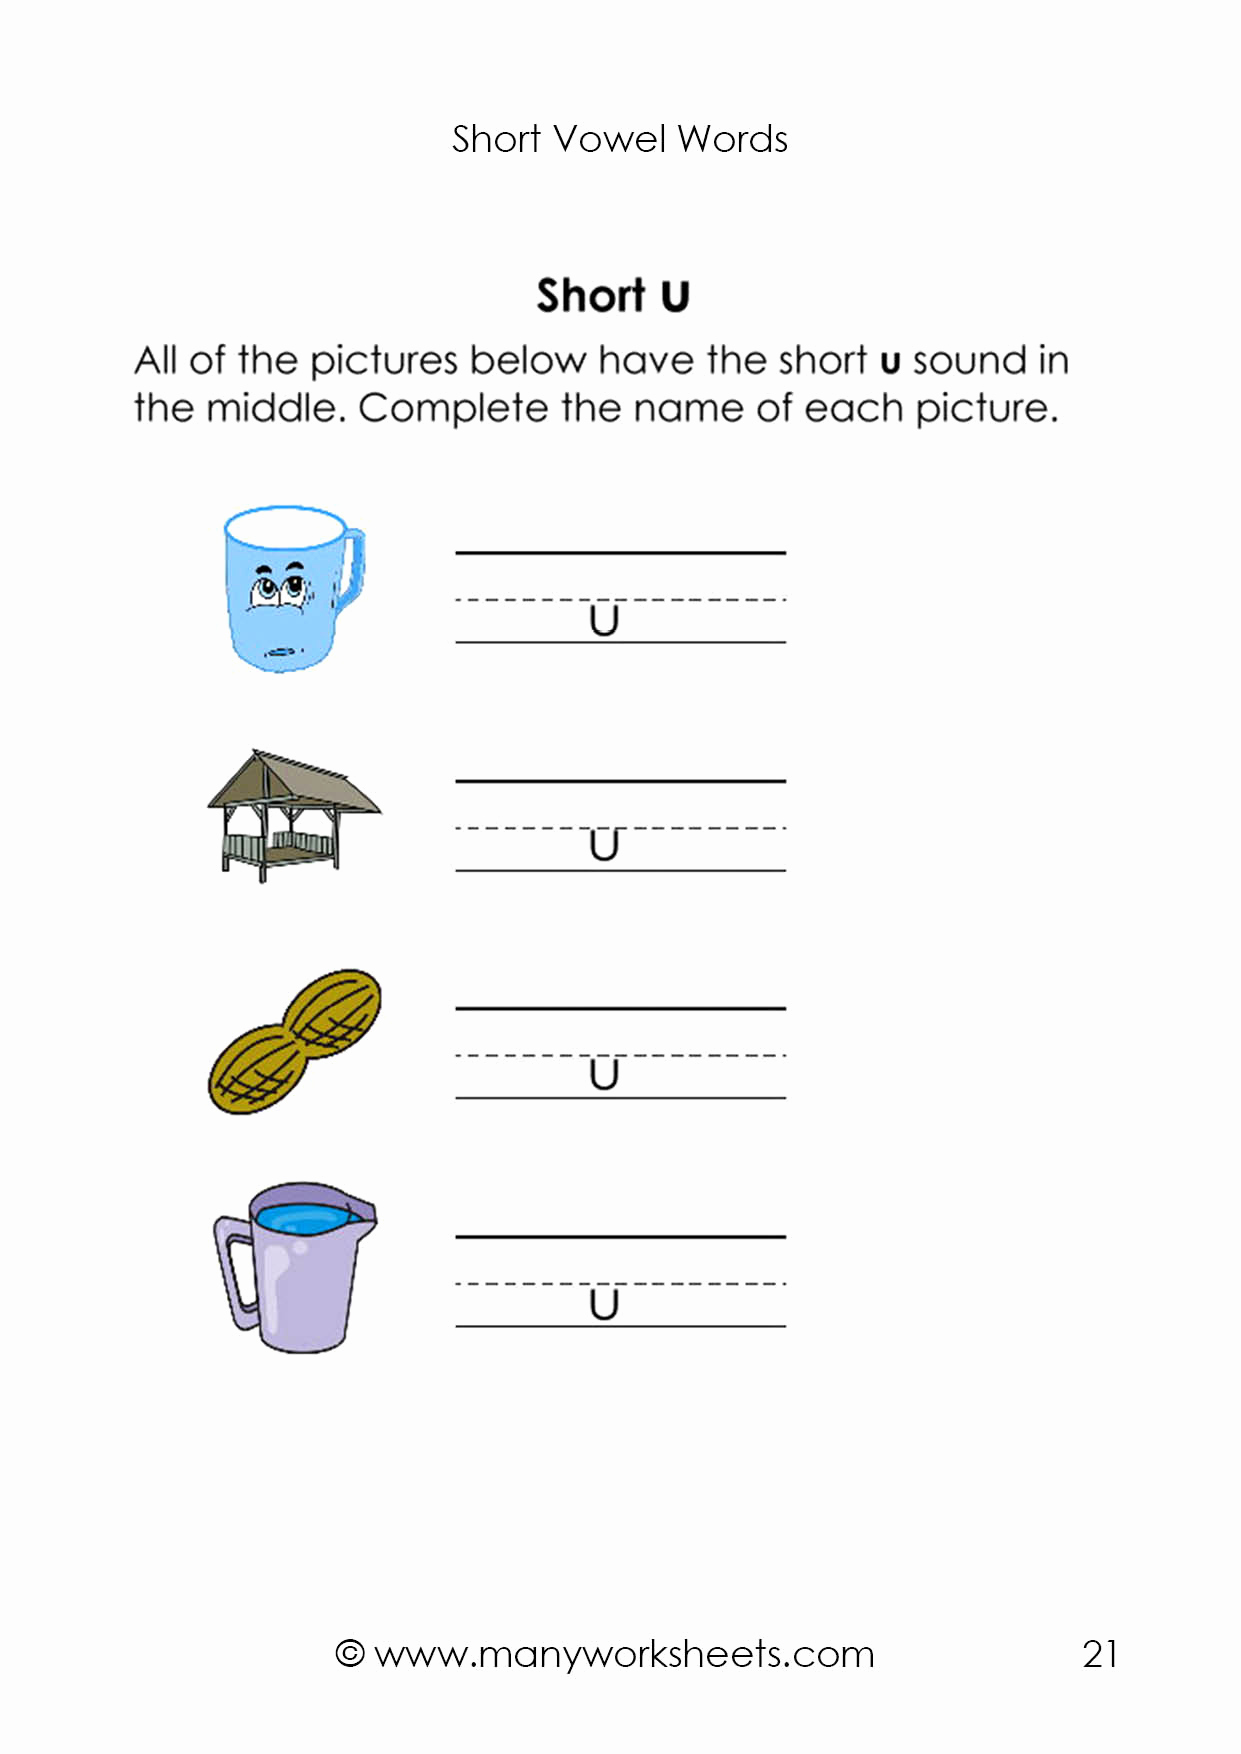 Short U Worksheets Pdf Beautiful Short Vowel U Worksheet 3